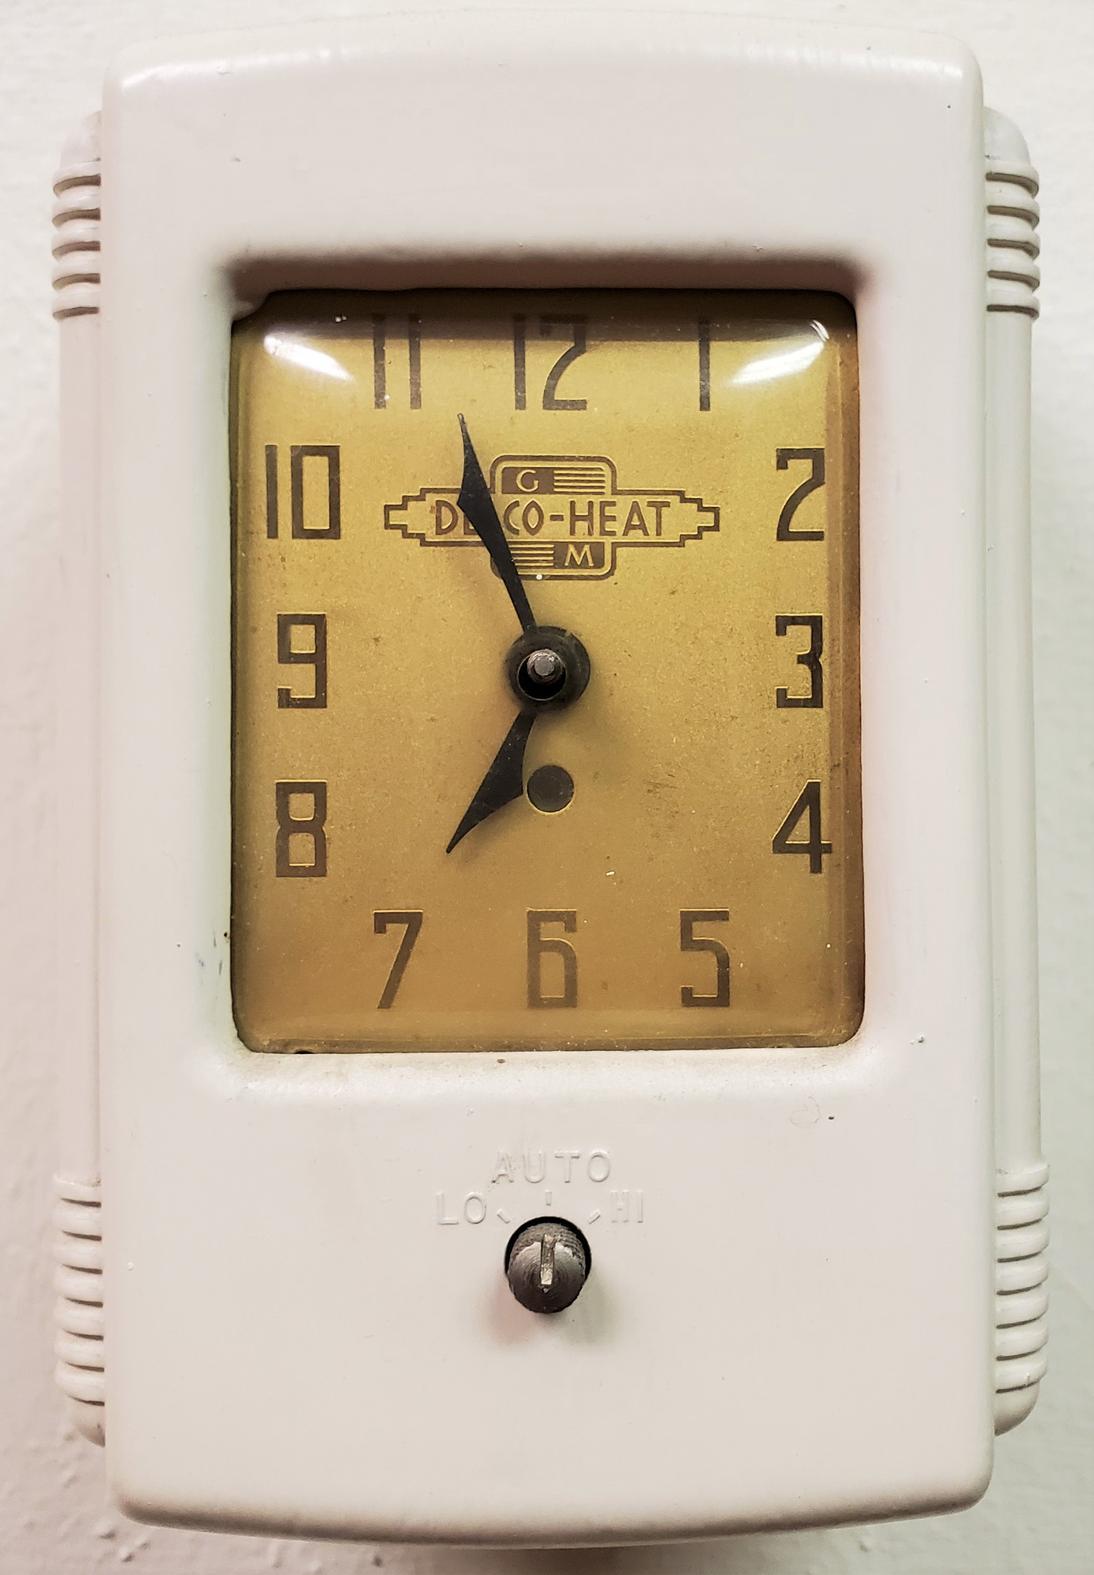 Deco Heat Controller